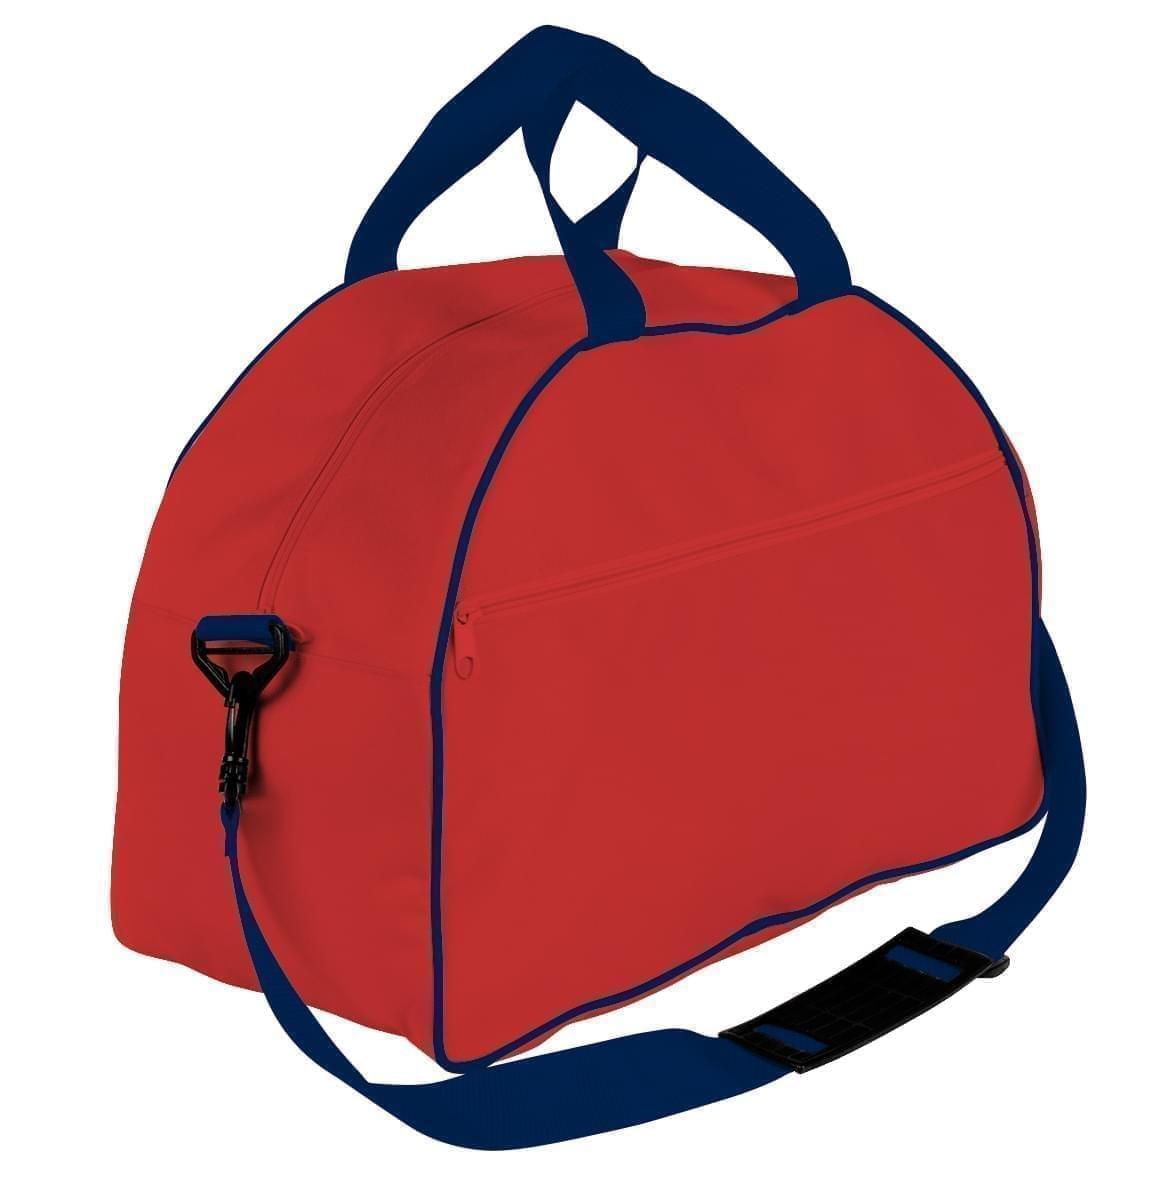 USA Made Nylon Poly Weekender Duffel Bags, Red-Navy, 6PKV32JAZZ